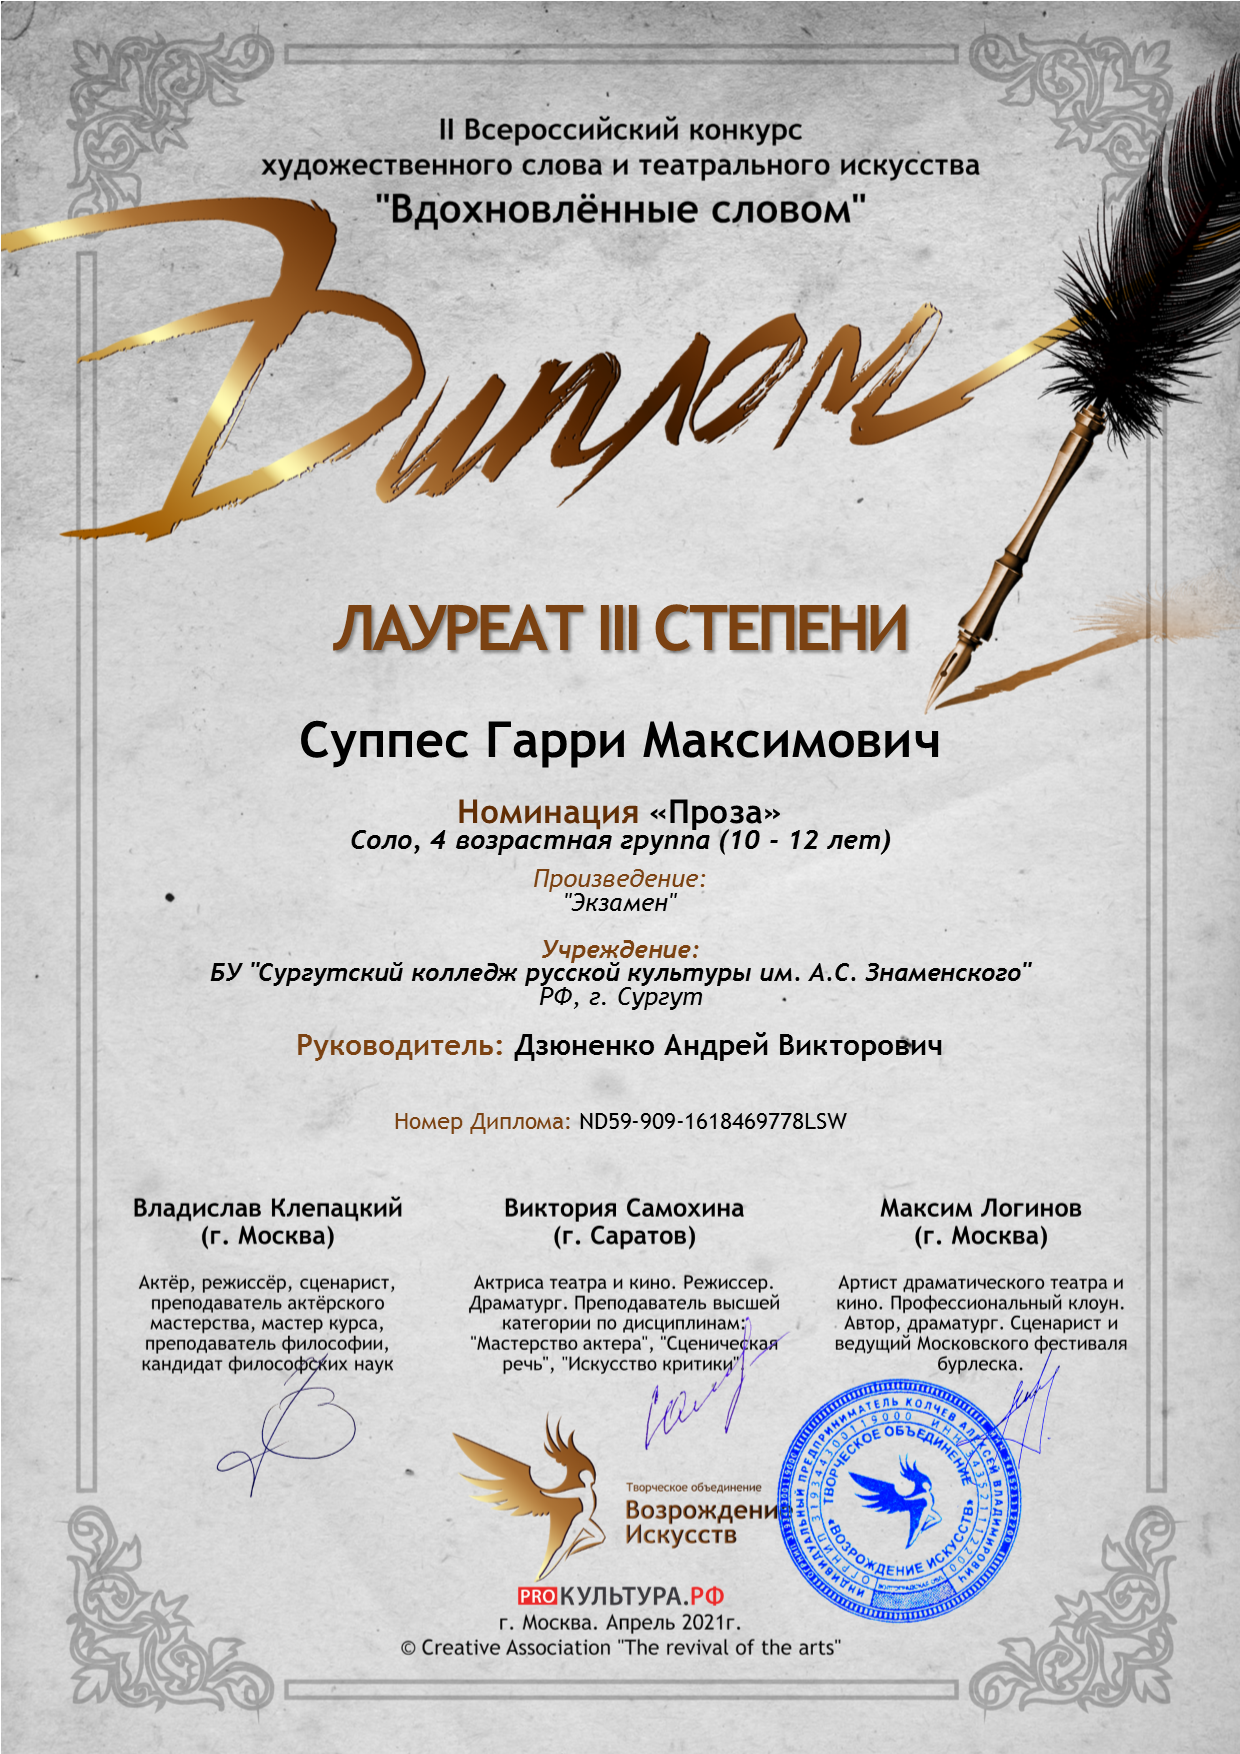 Суппес Гарри Максимович (1)